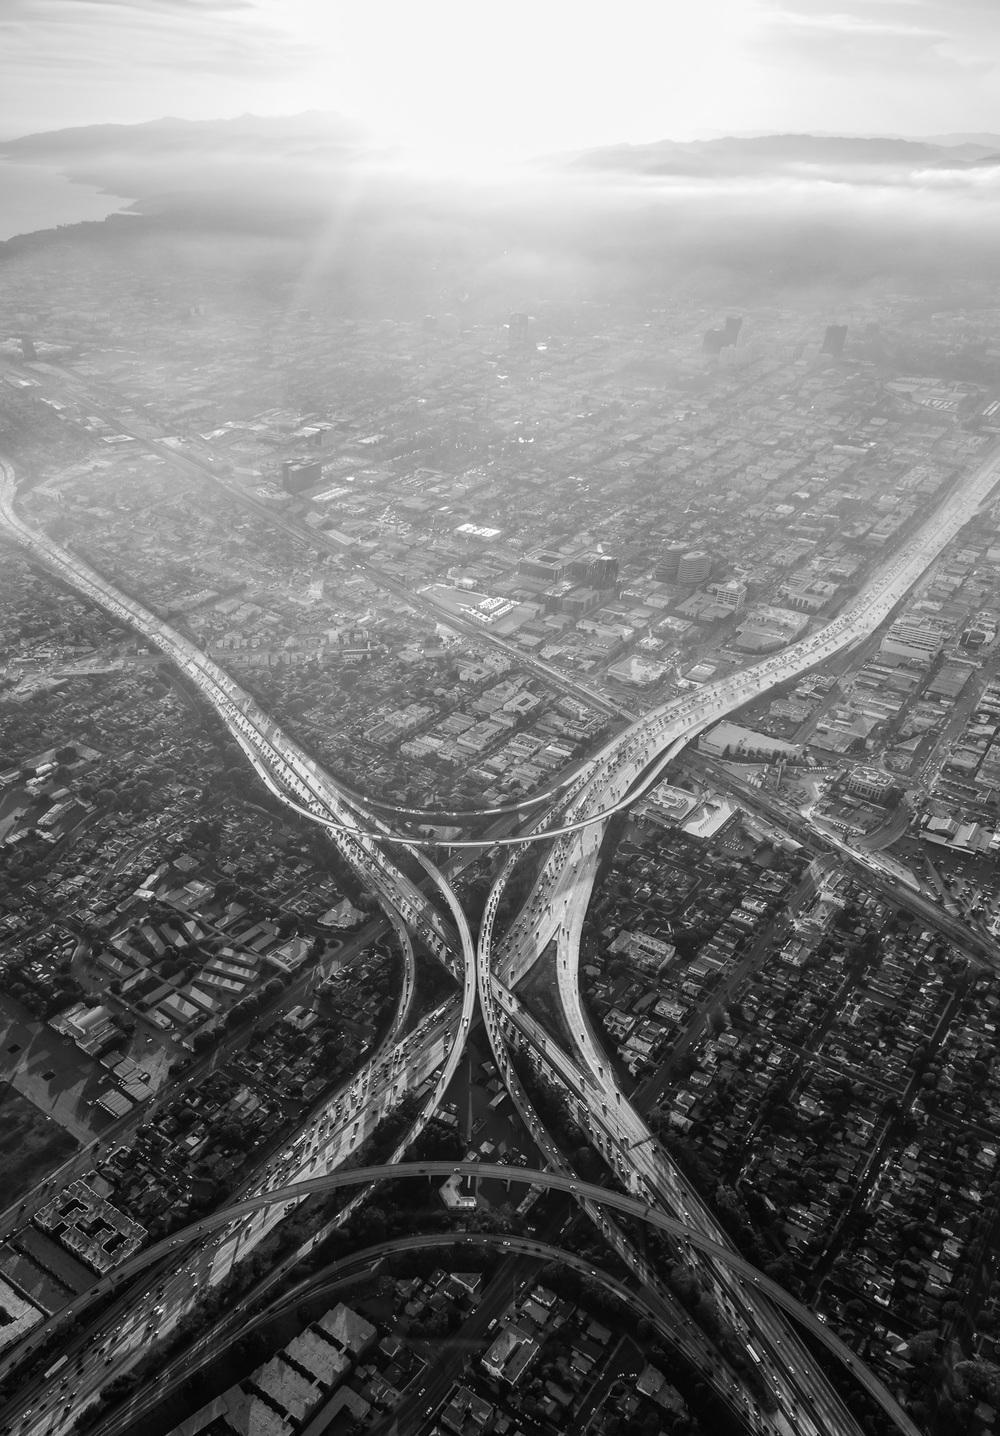 Los-Angeles-Aerial-Photography-3.jpg